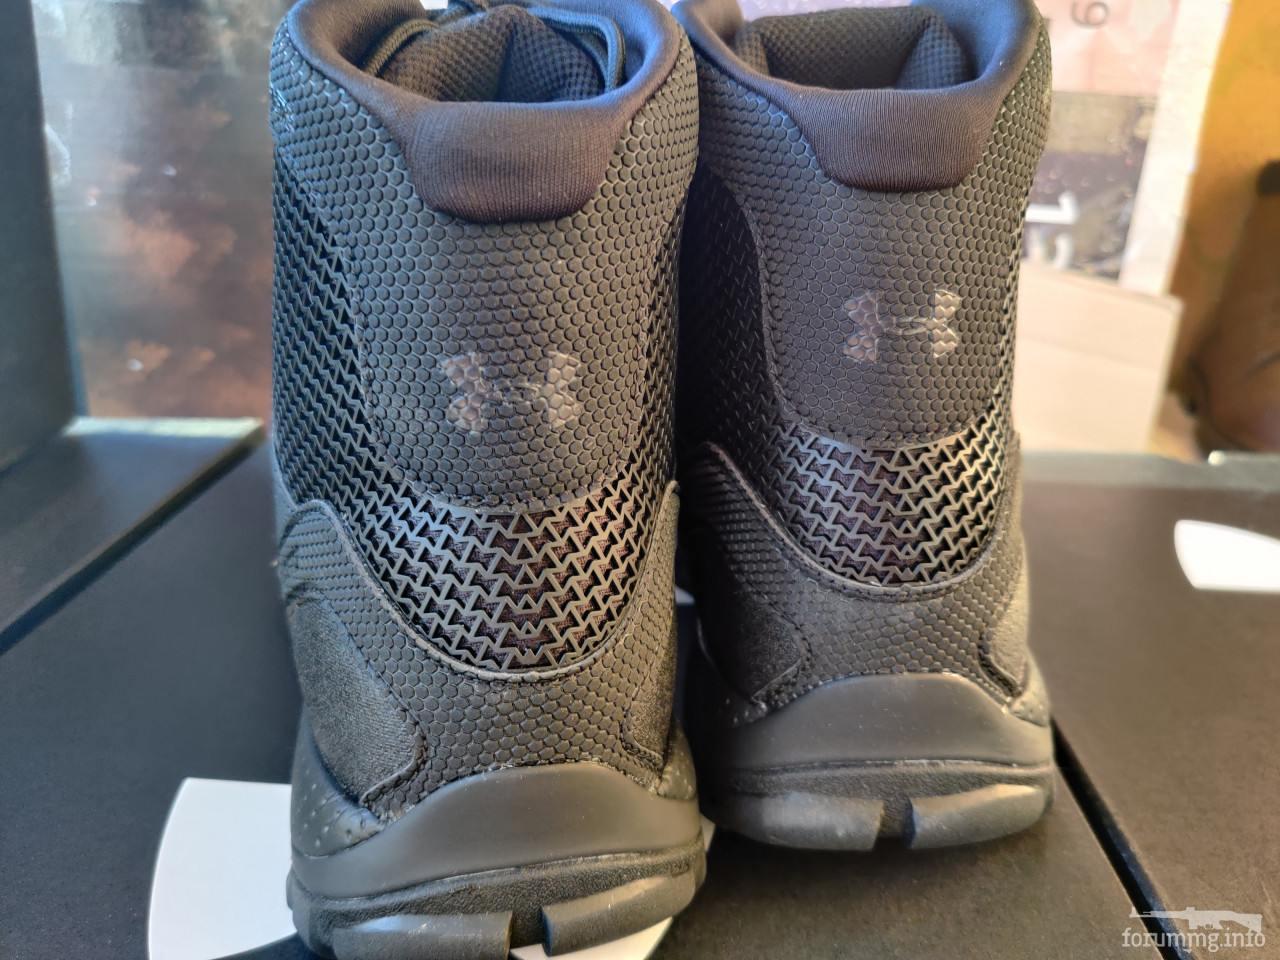 138692 - Under Armour Valsetz Boots (Under Armour Tactical Boots) 40-47р